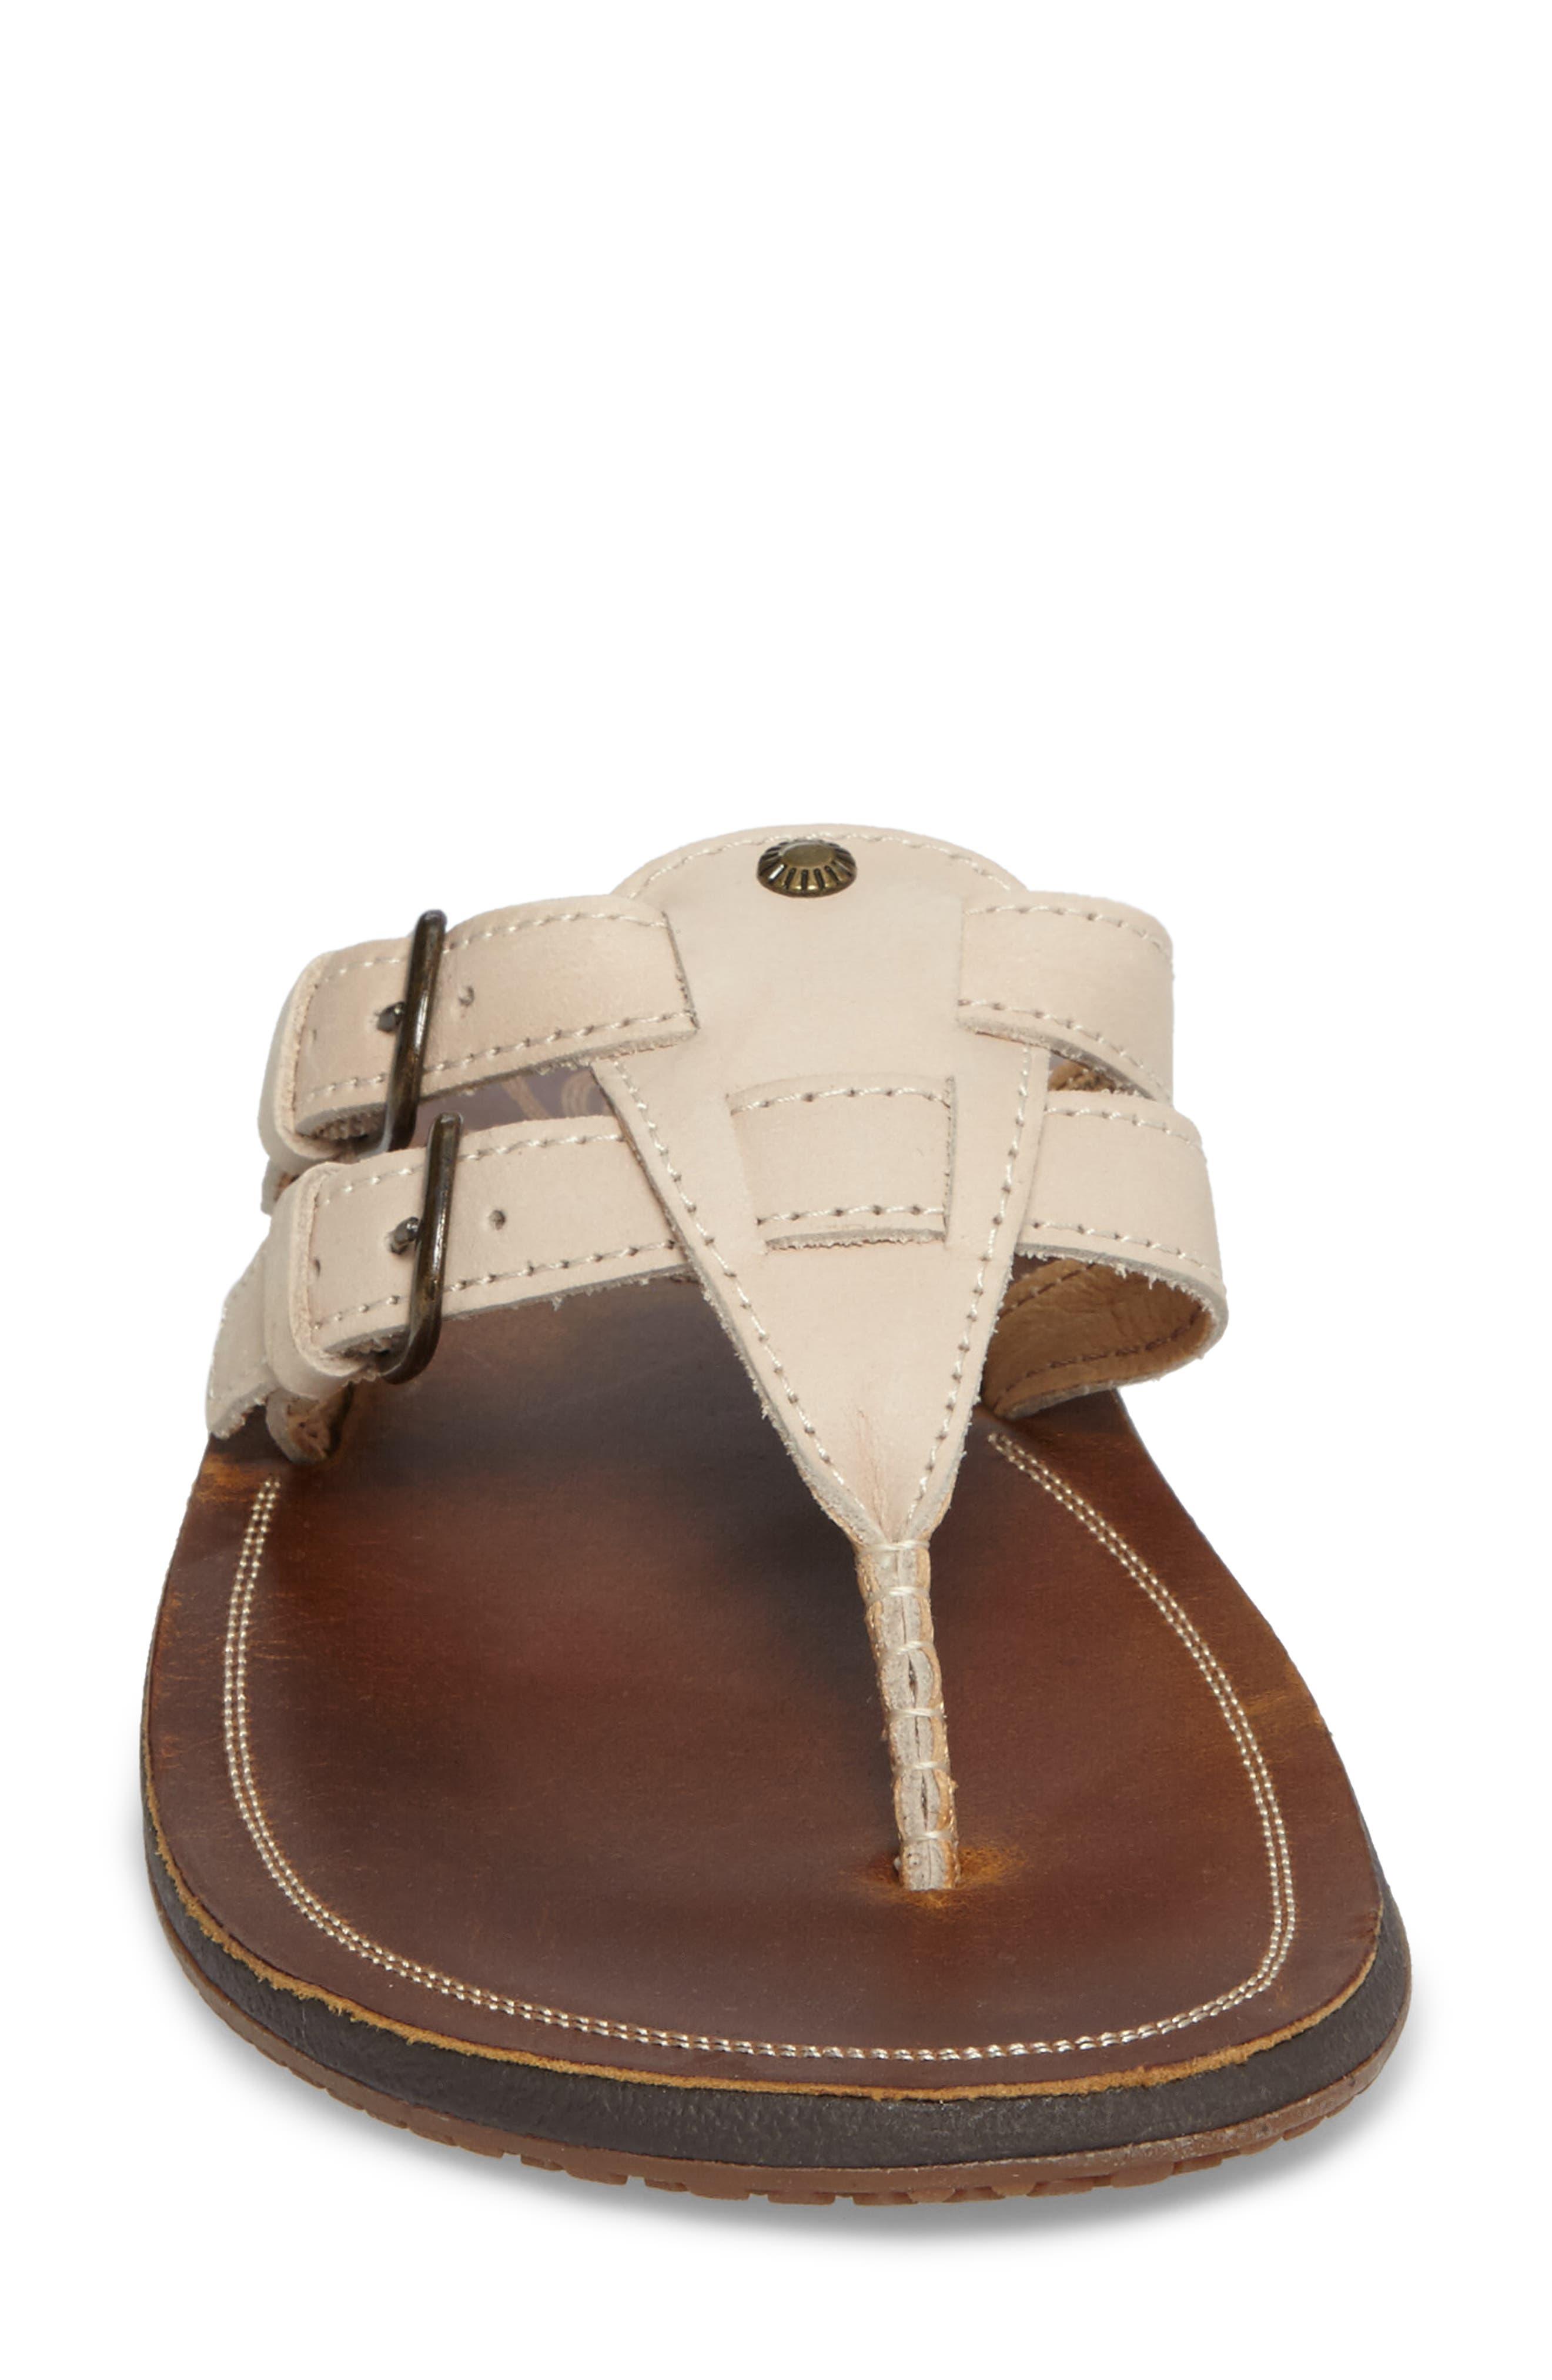 Honoka'a Buckle Flip Flop,                             Alternate thumbnail 4, color,                             Tapa/ Sahara Leather